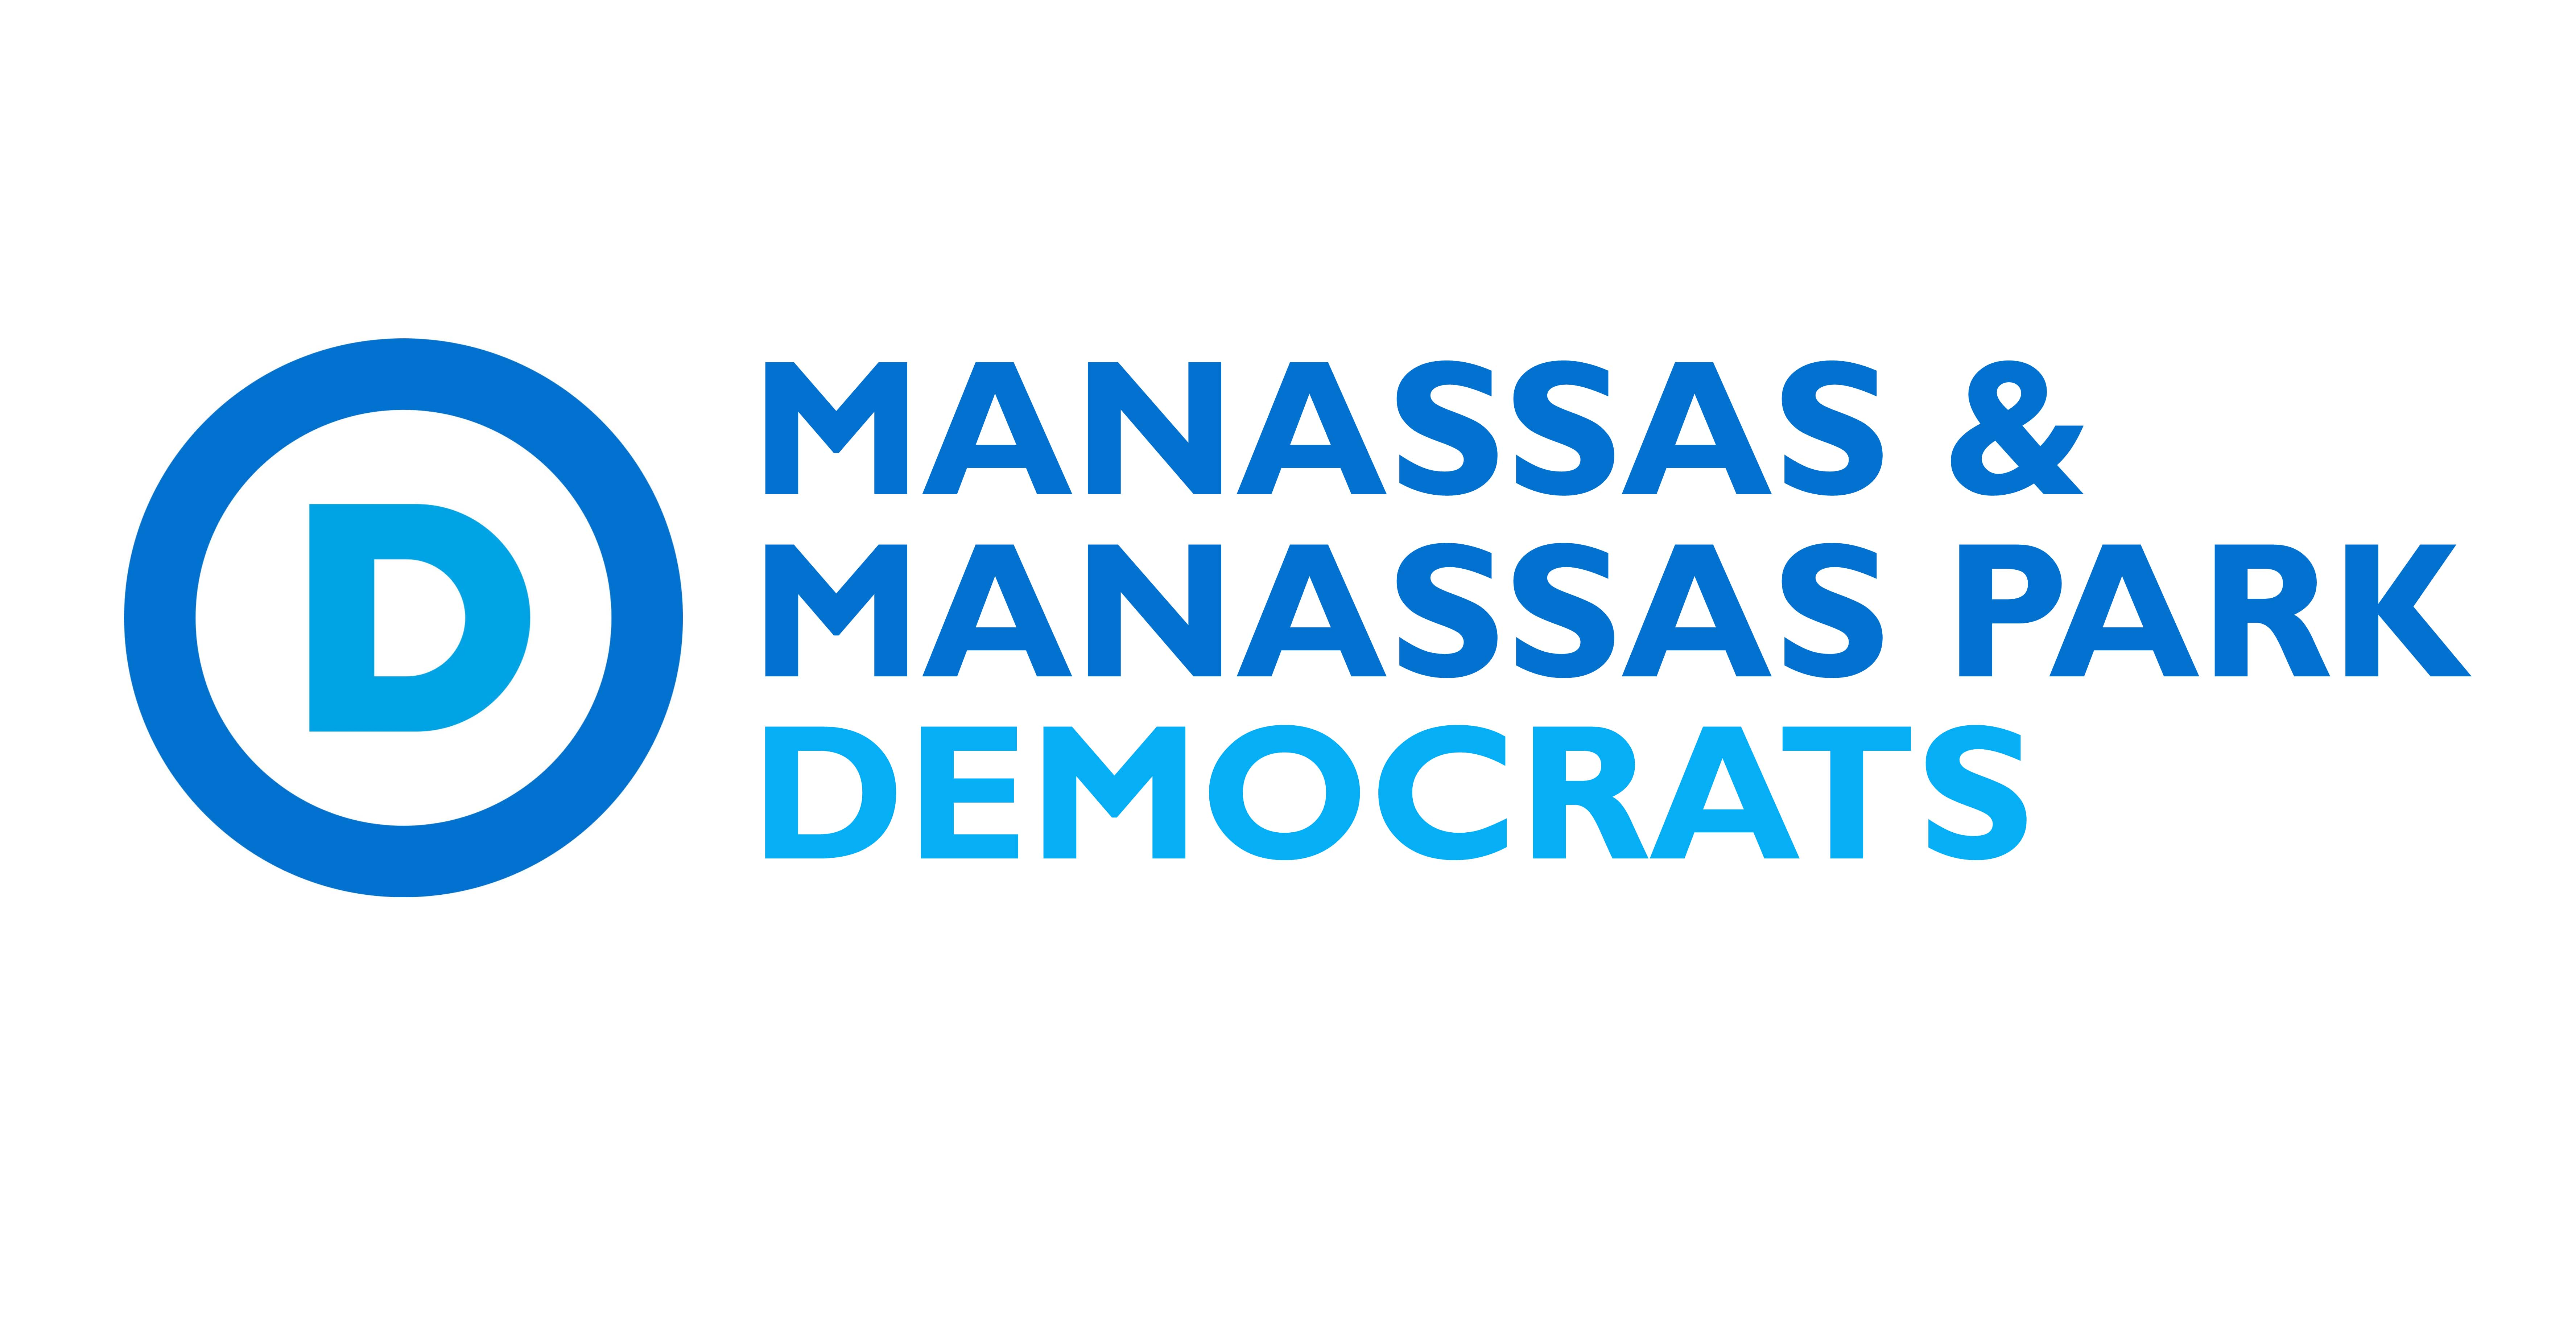 manassas manassas park cities democratic committee turning